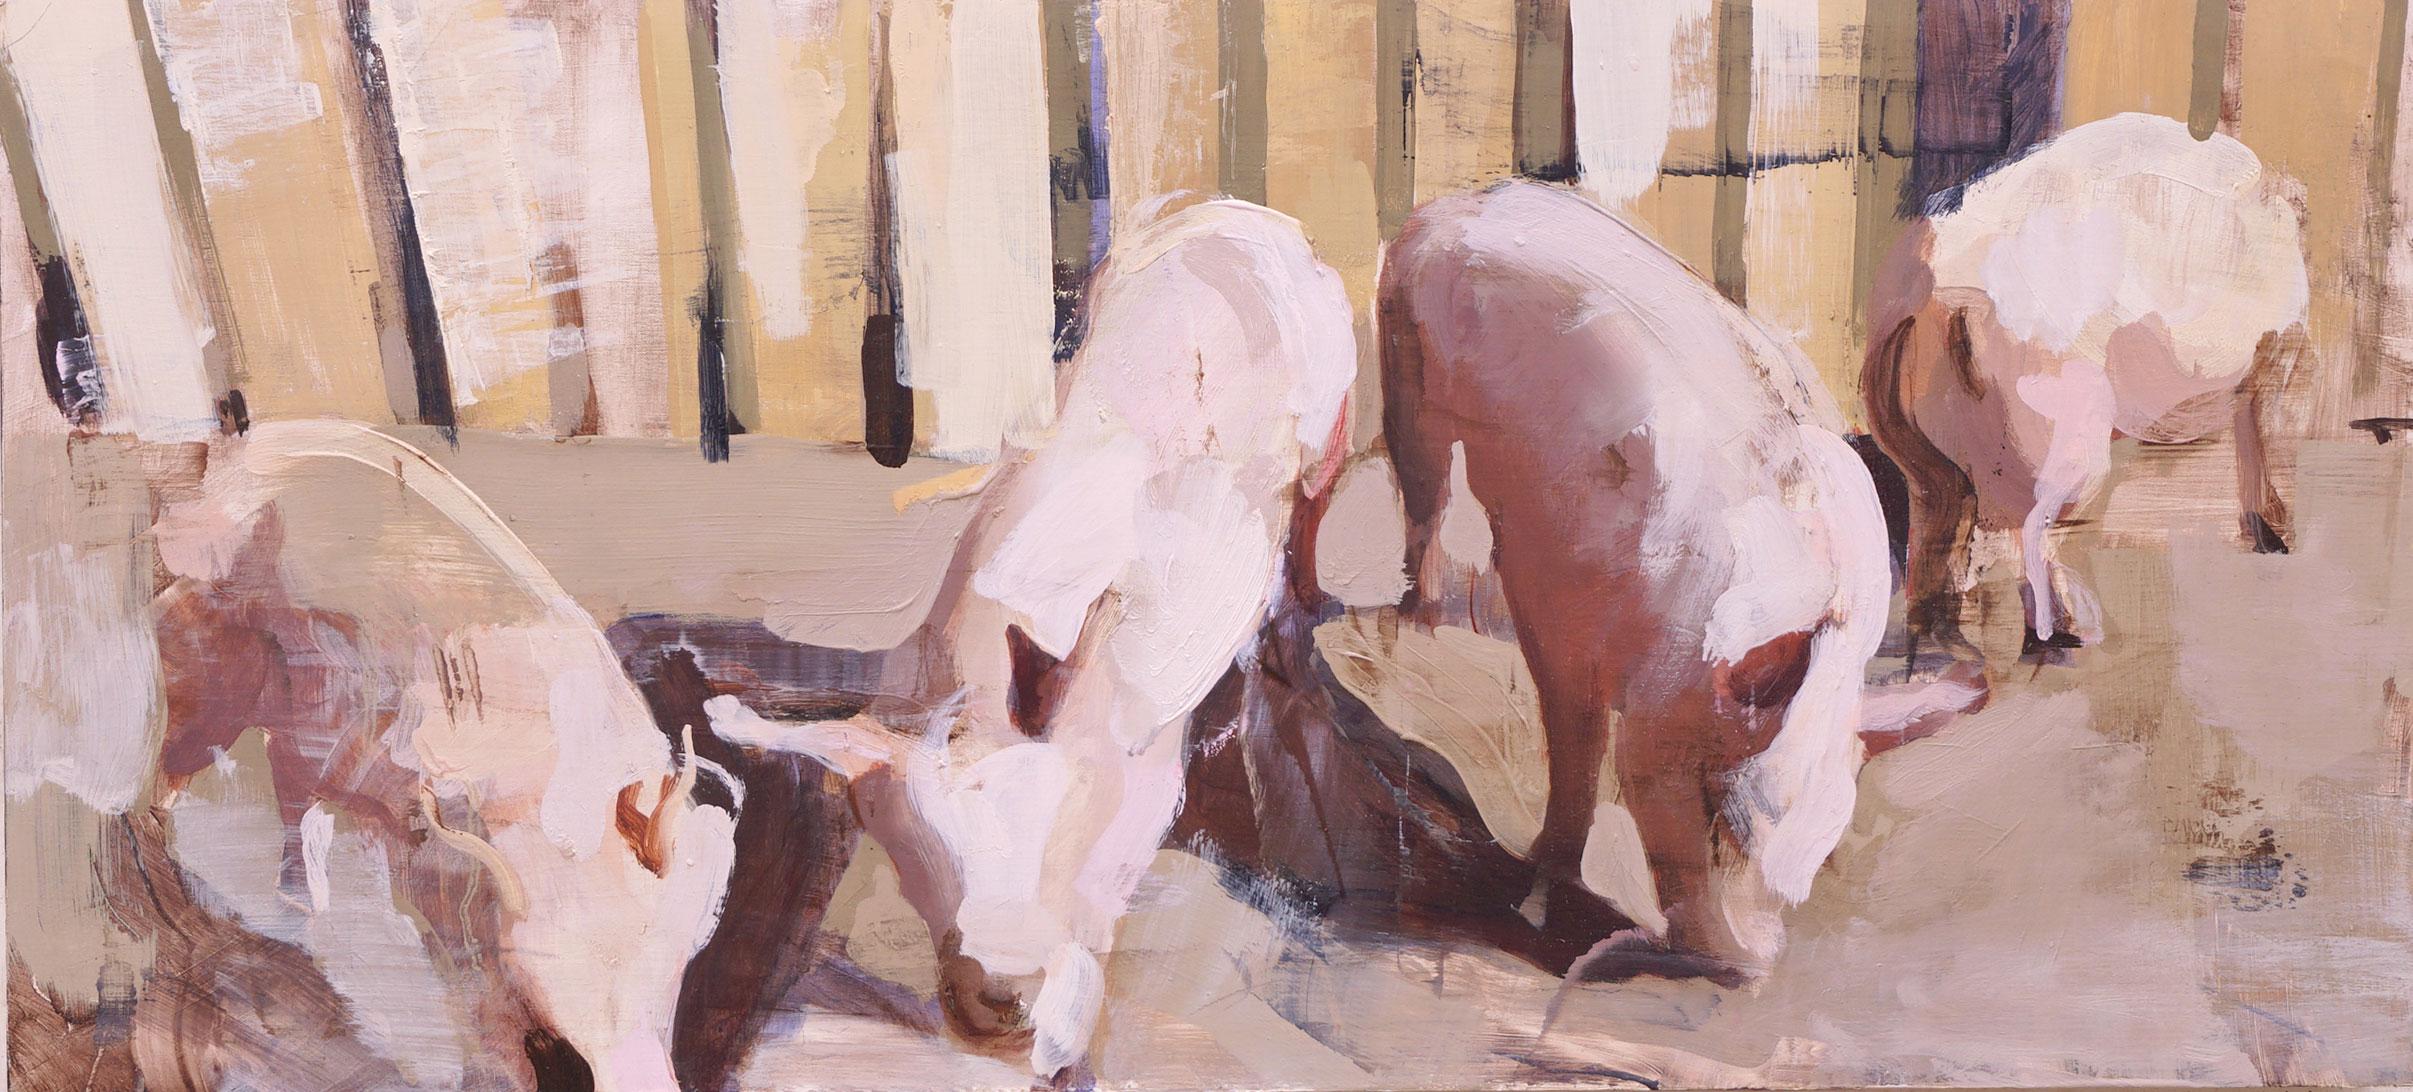 mark-crenshaw-1521-4-little-pigs.jpg